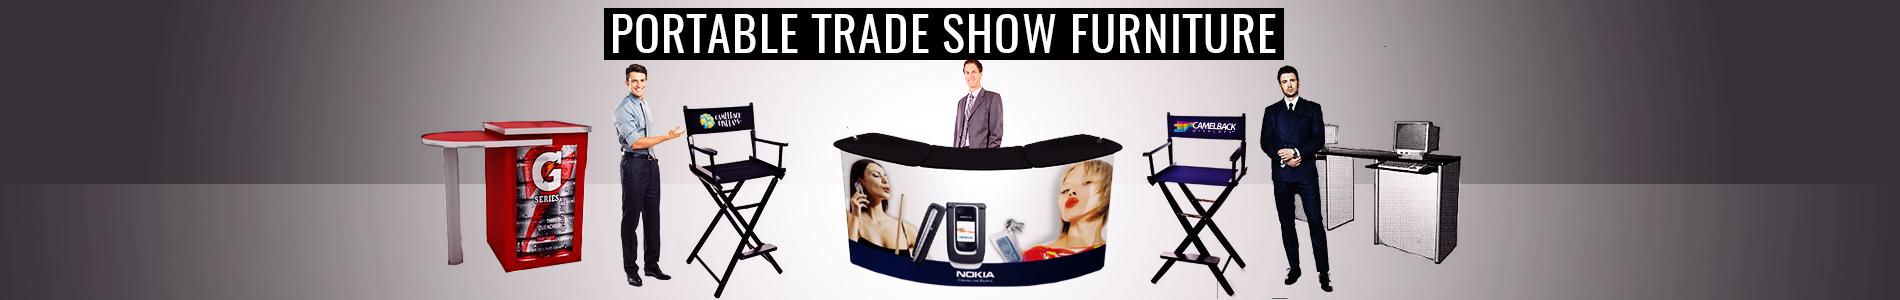 Portable Trade Show Furniture